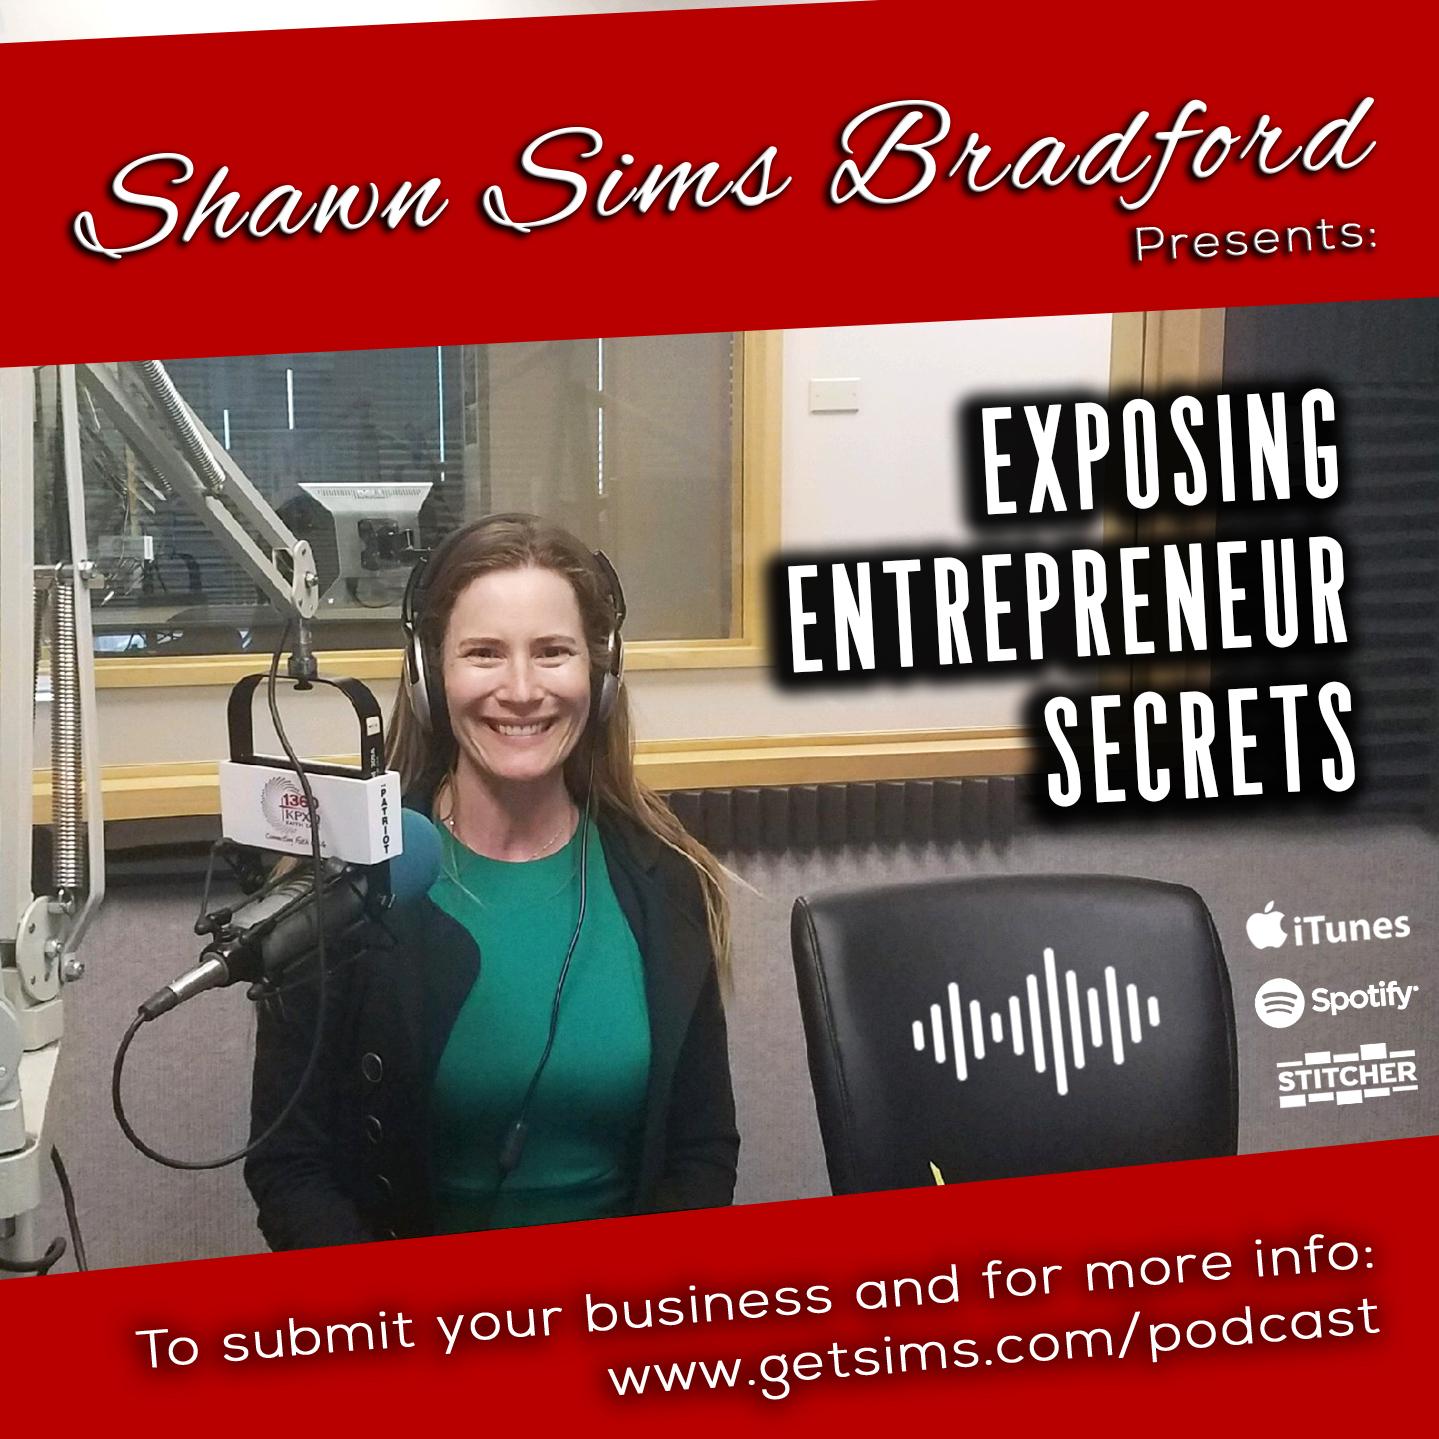 Exposing Entrepreneur Secrets show art